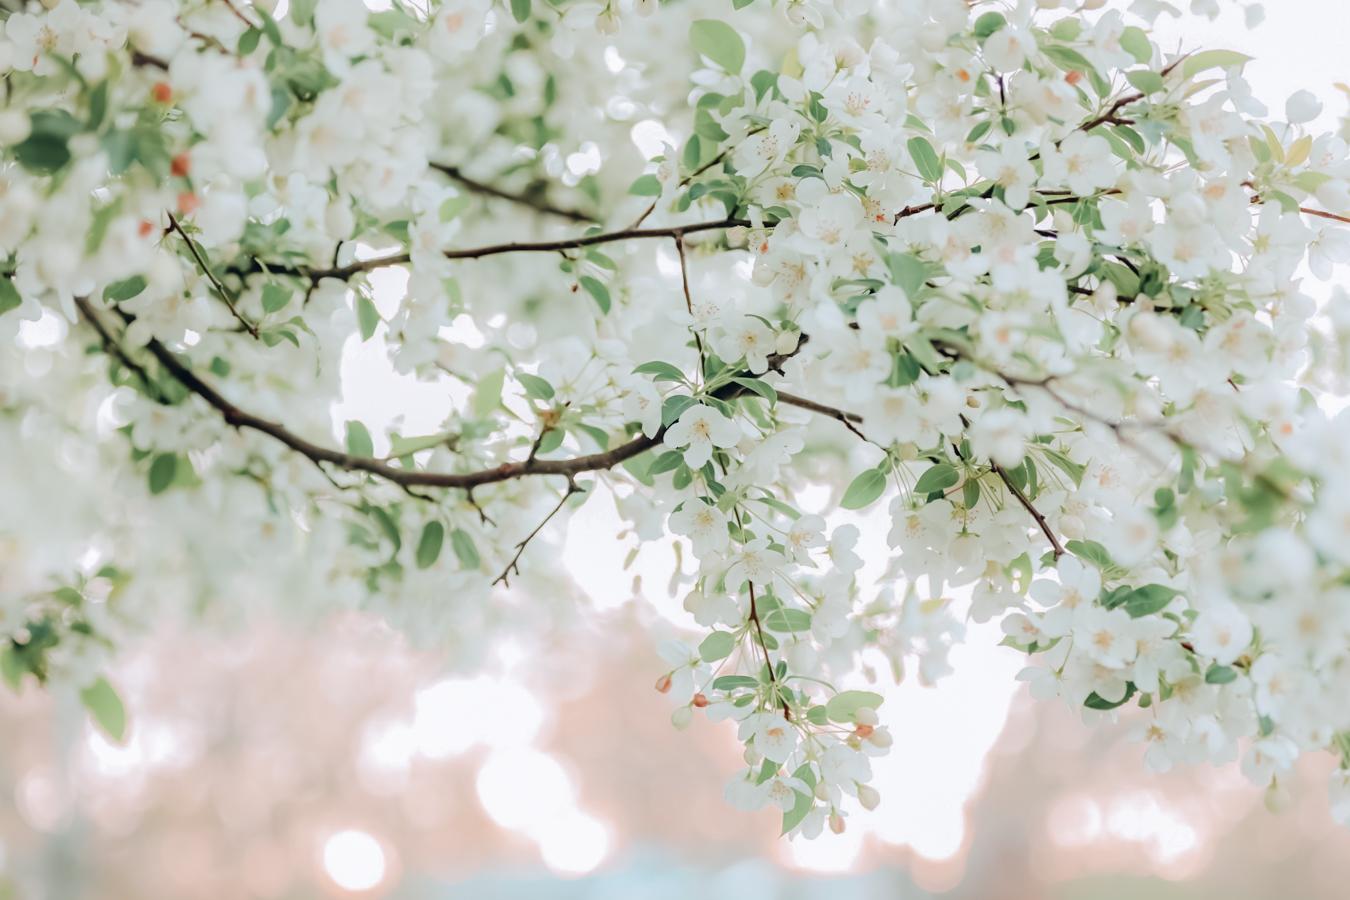 Flowers at the Arnold Arboretum